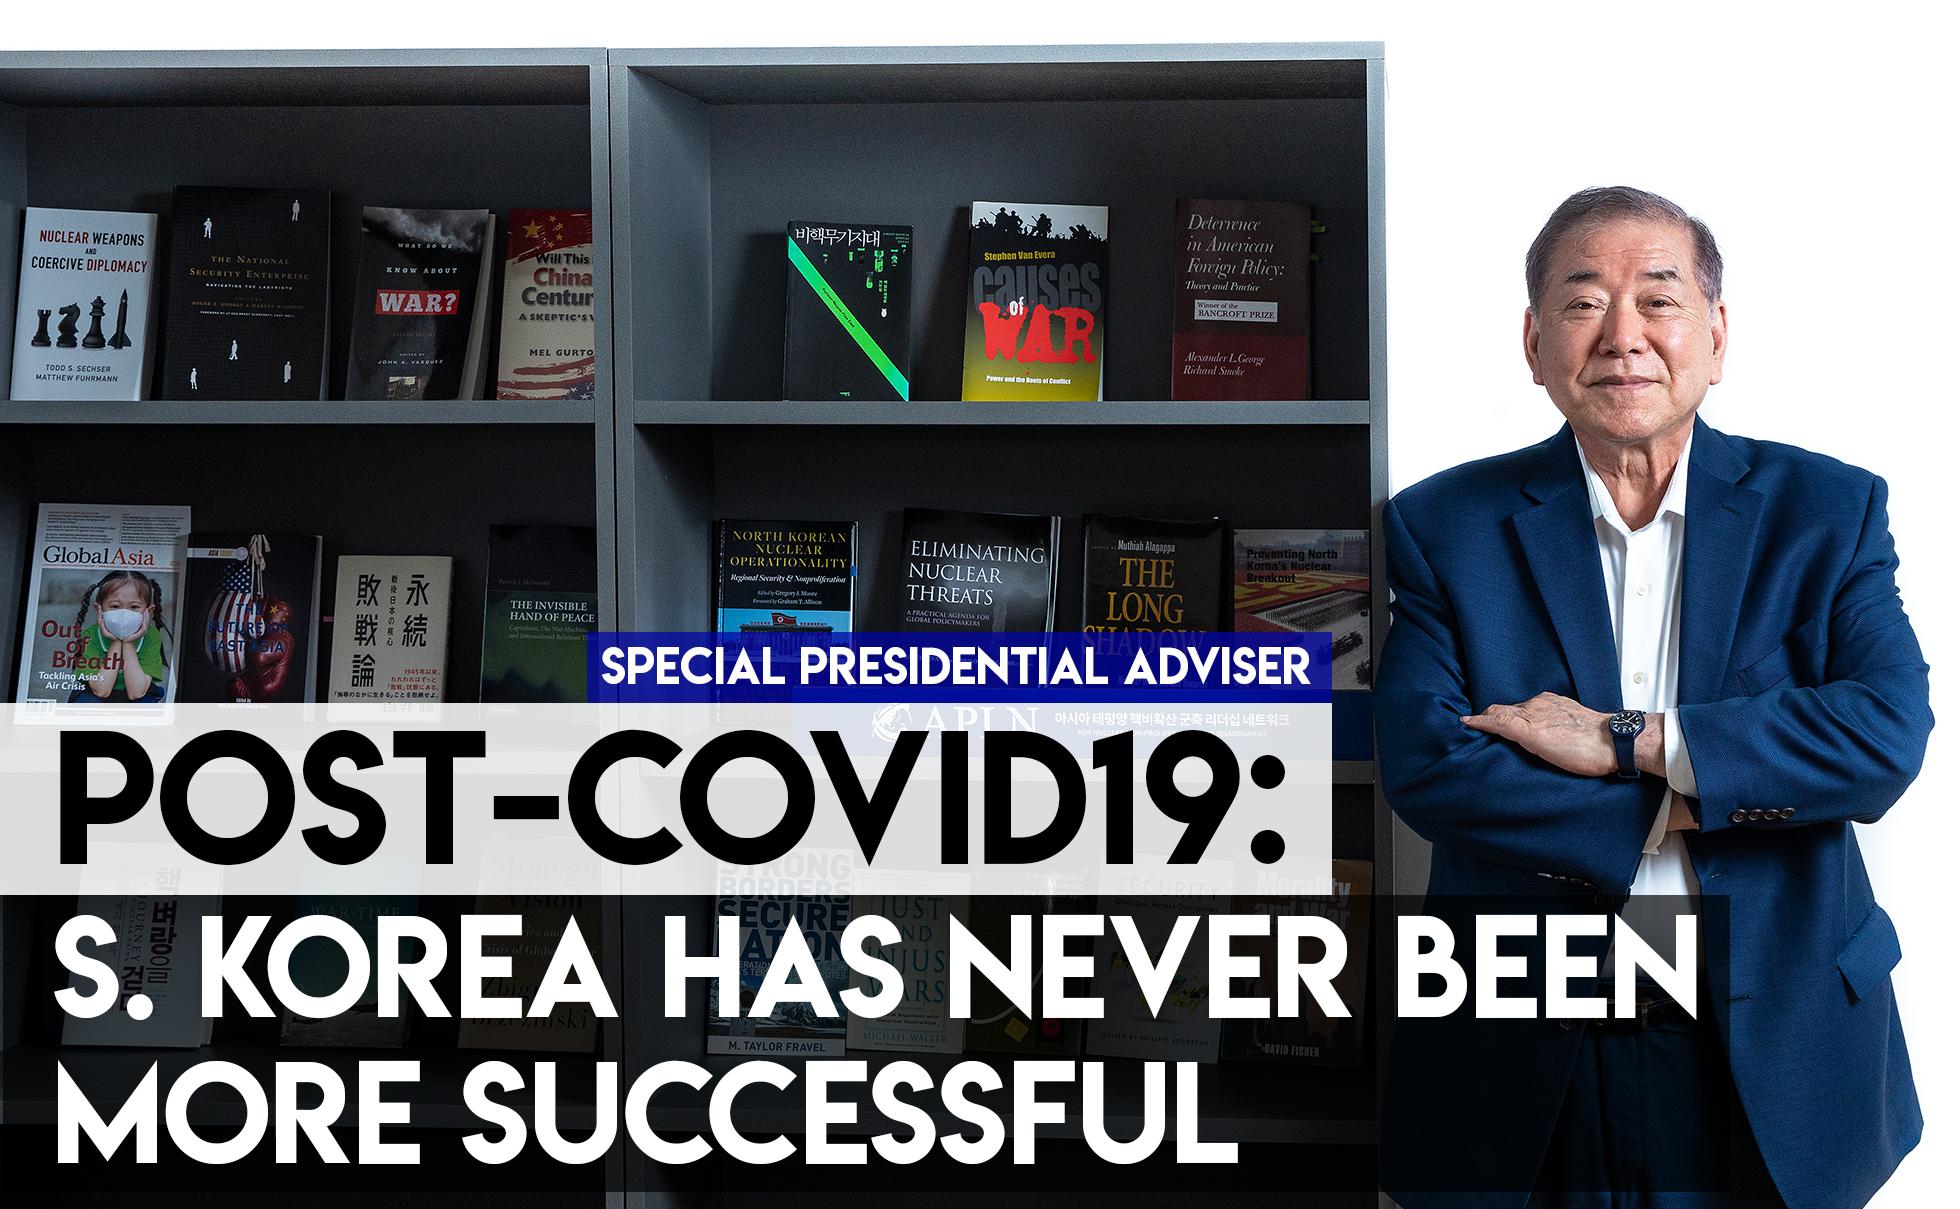 Rise of Korean soft power after COVID-19: presidential adviser